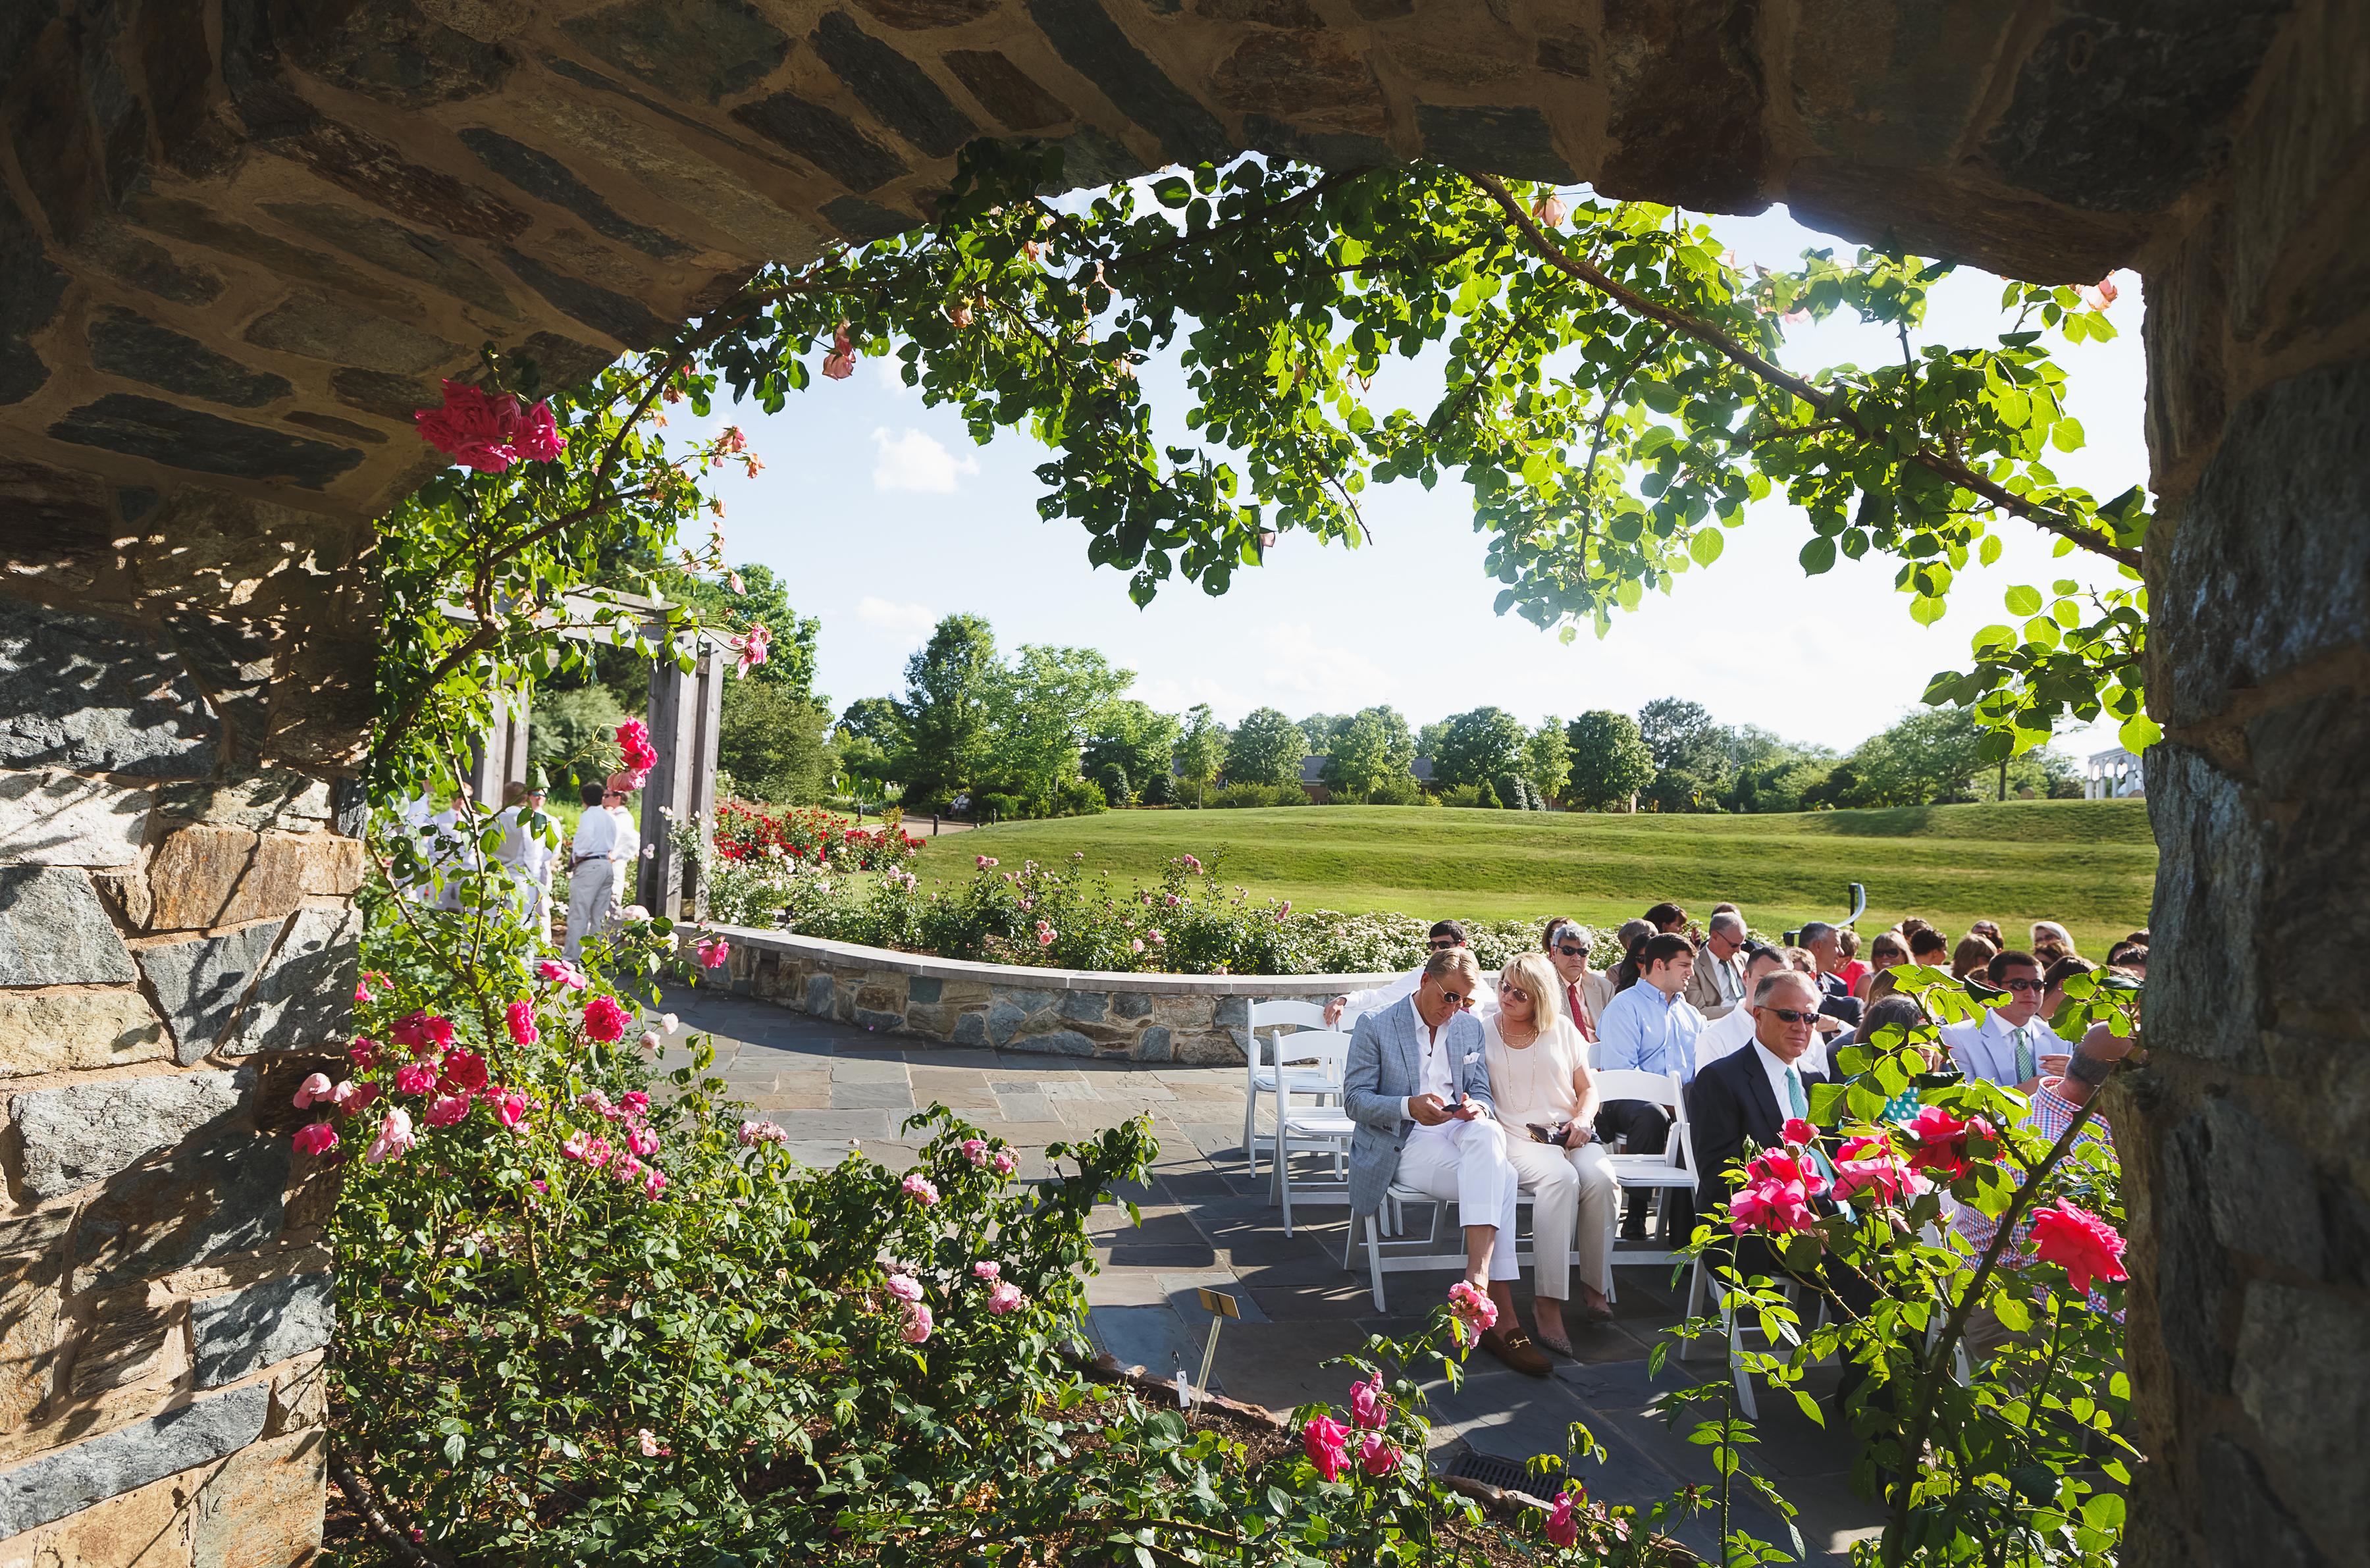 Robins Visitors Center Weddings Lewis Ginter Botanical Garden